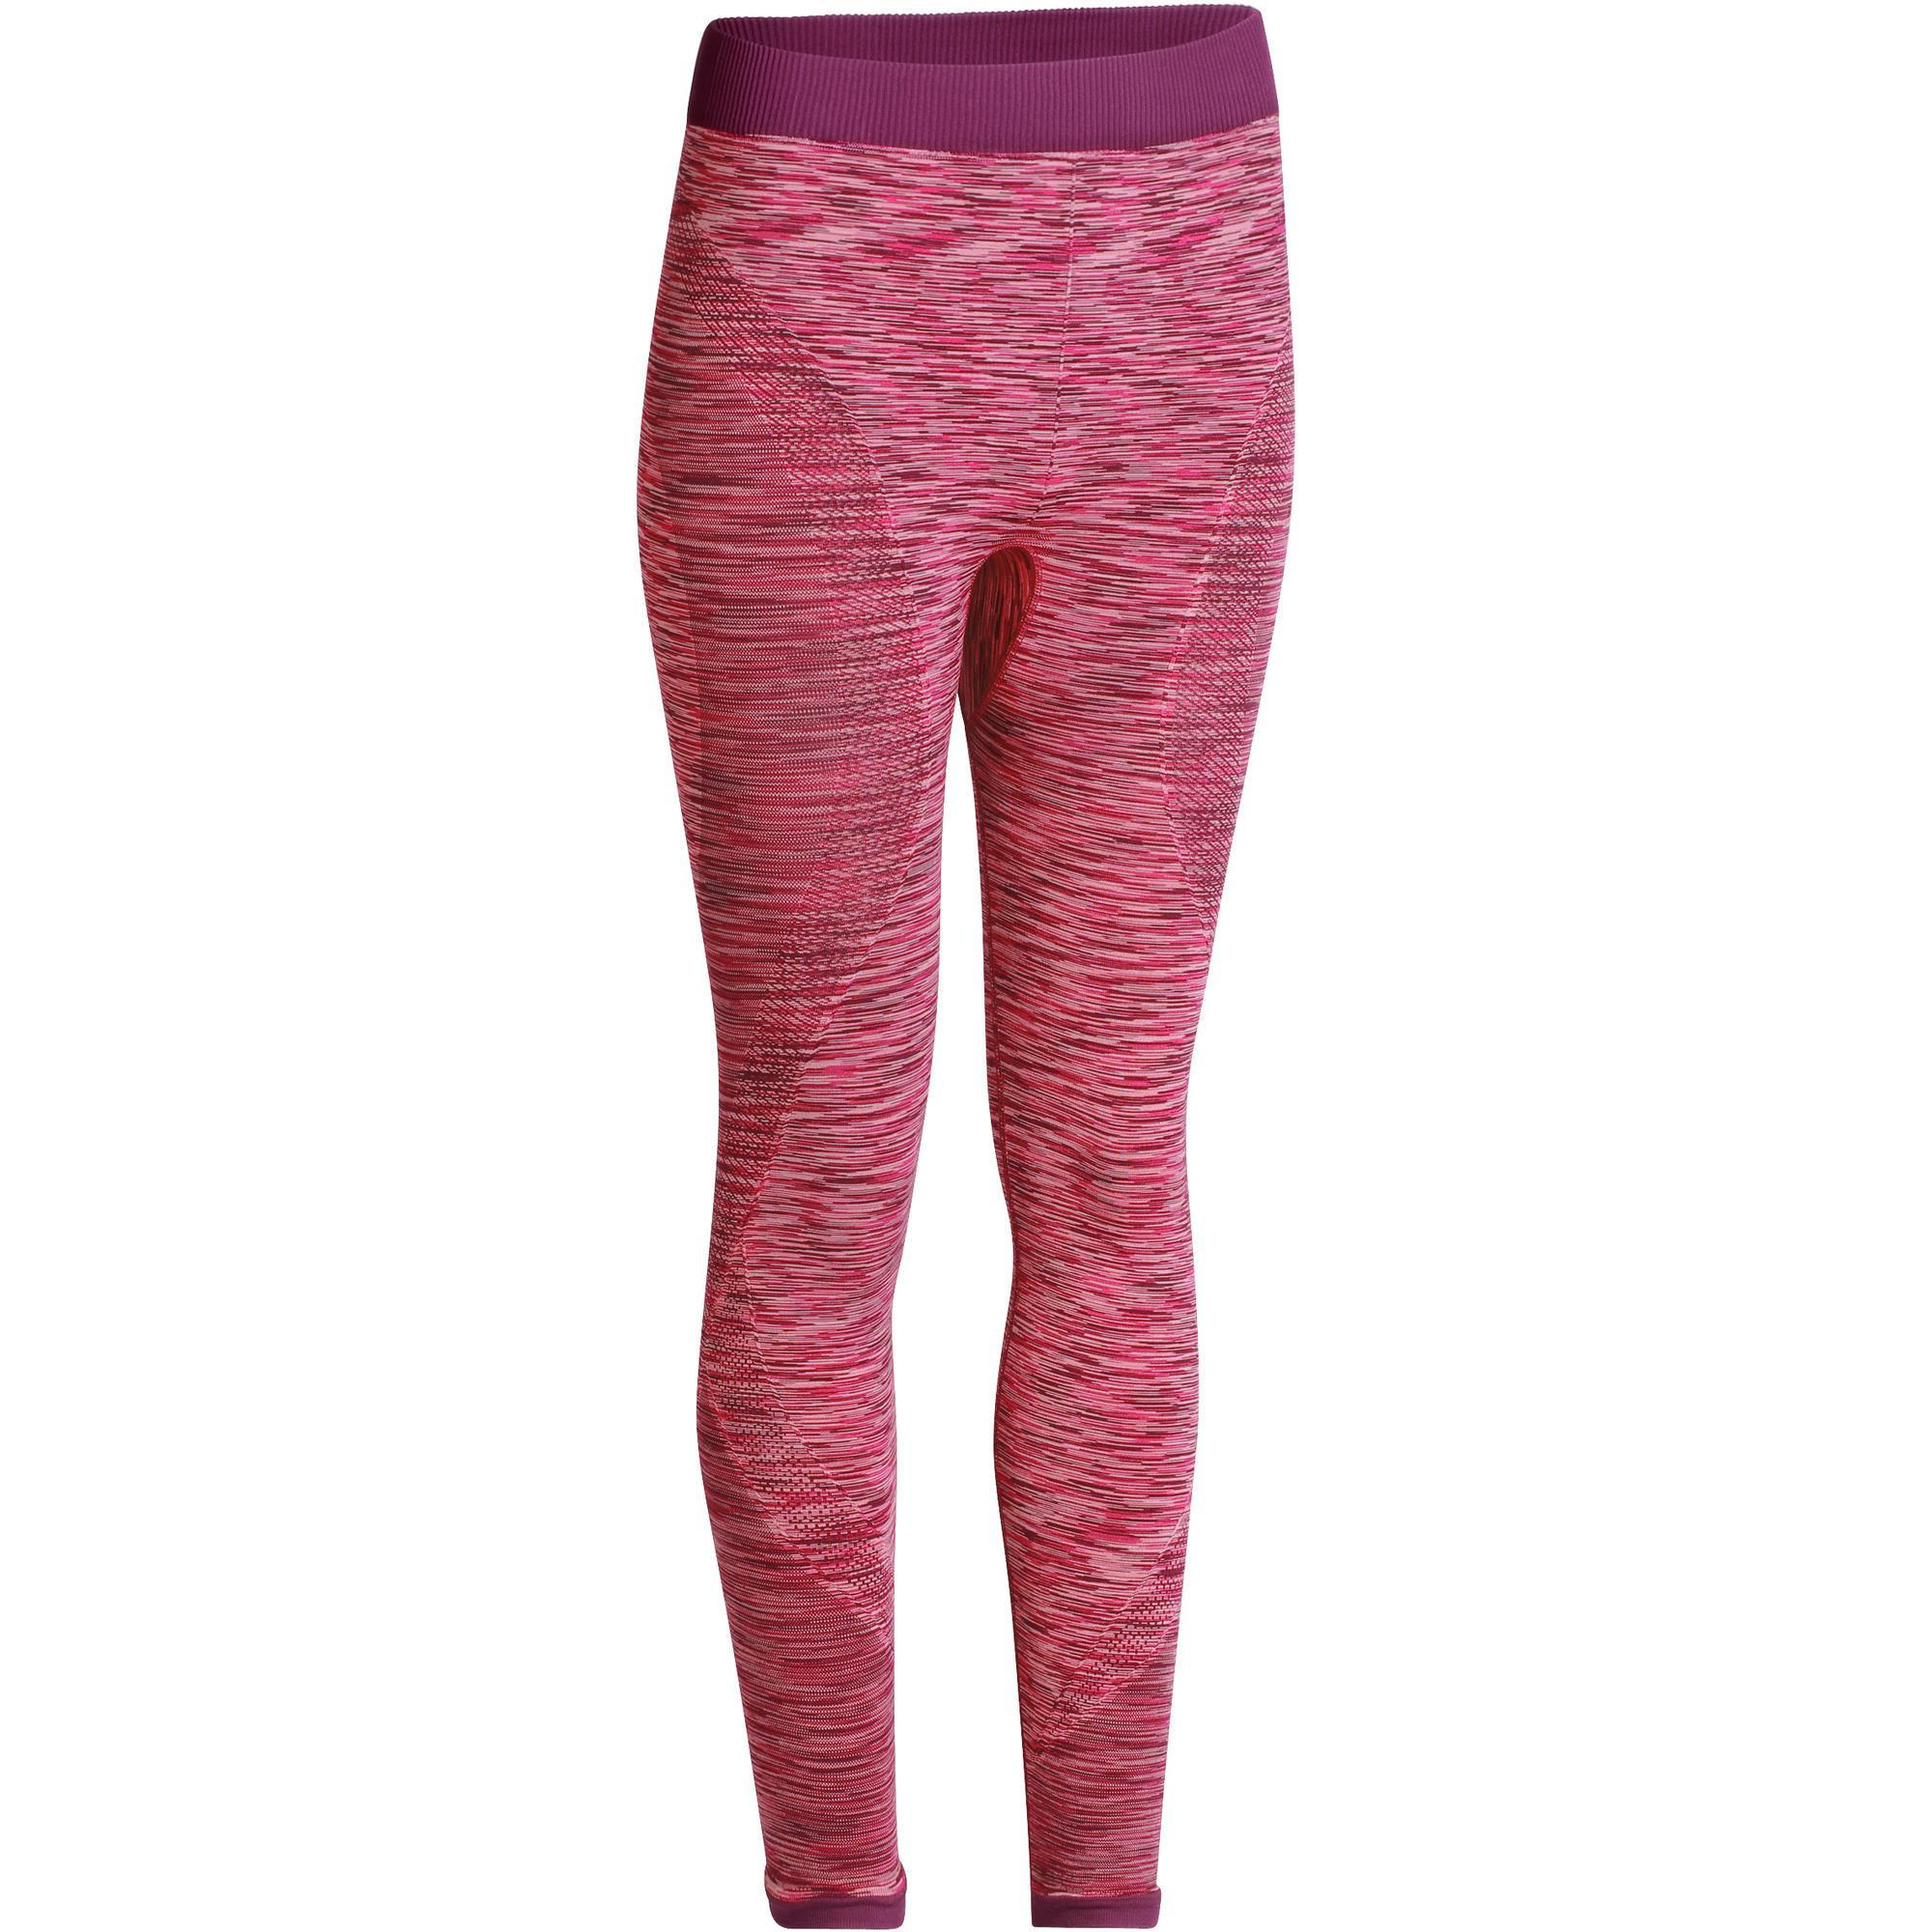 069095a30a9845 Yoga+ 500 Women's Seamless 7/8 Leggings - Pink | Domyos by Decathlon